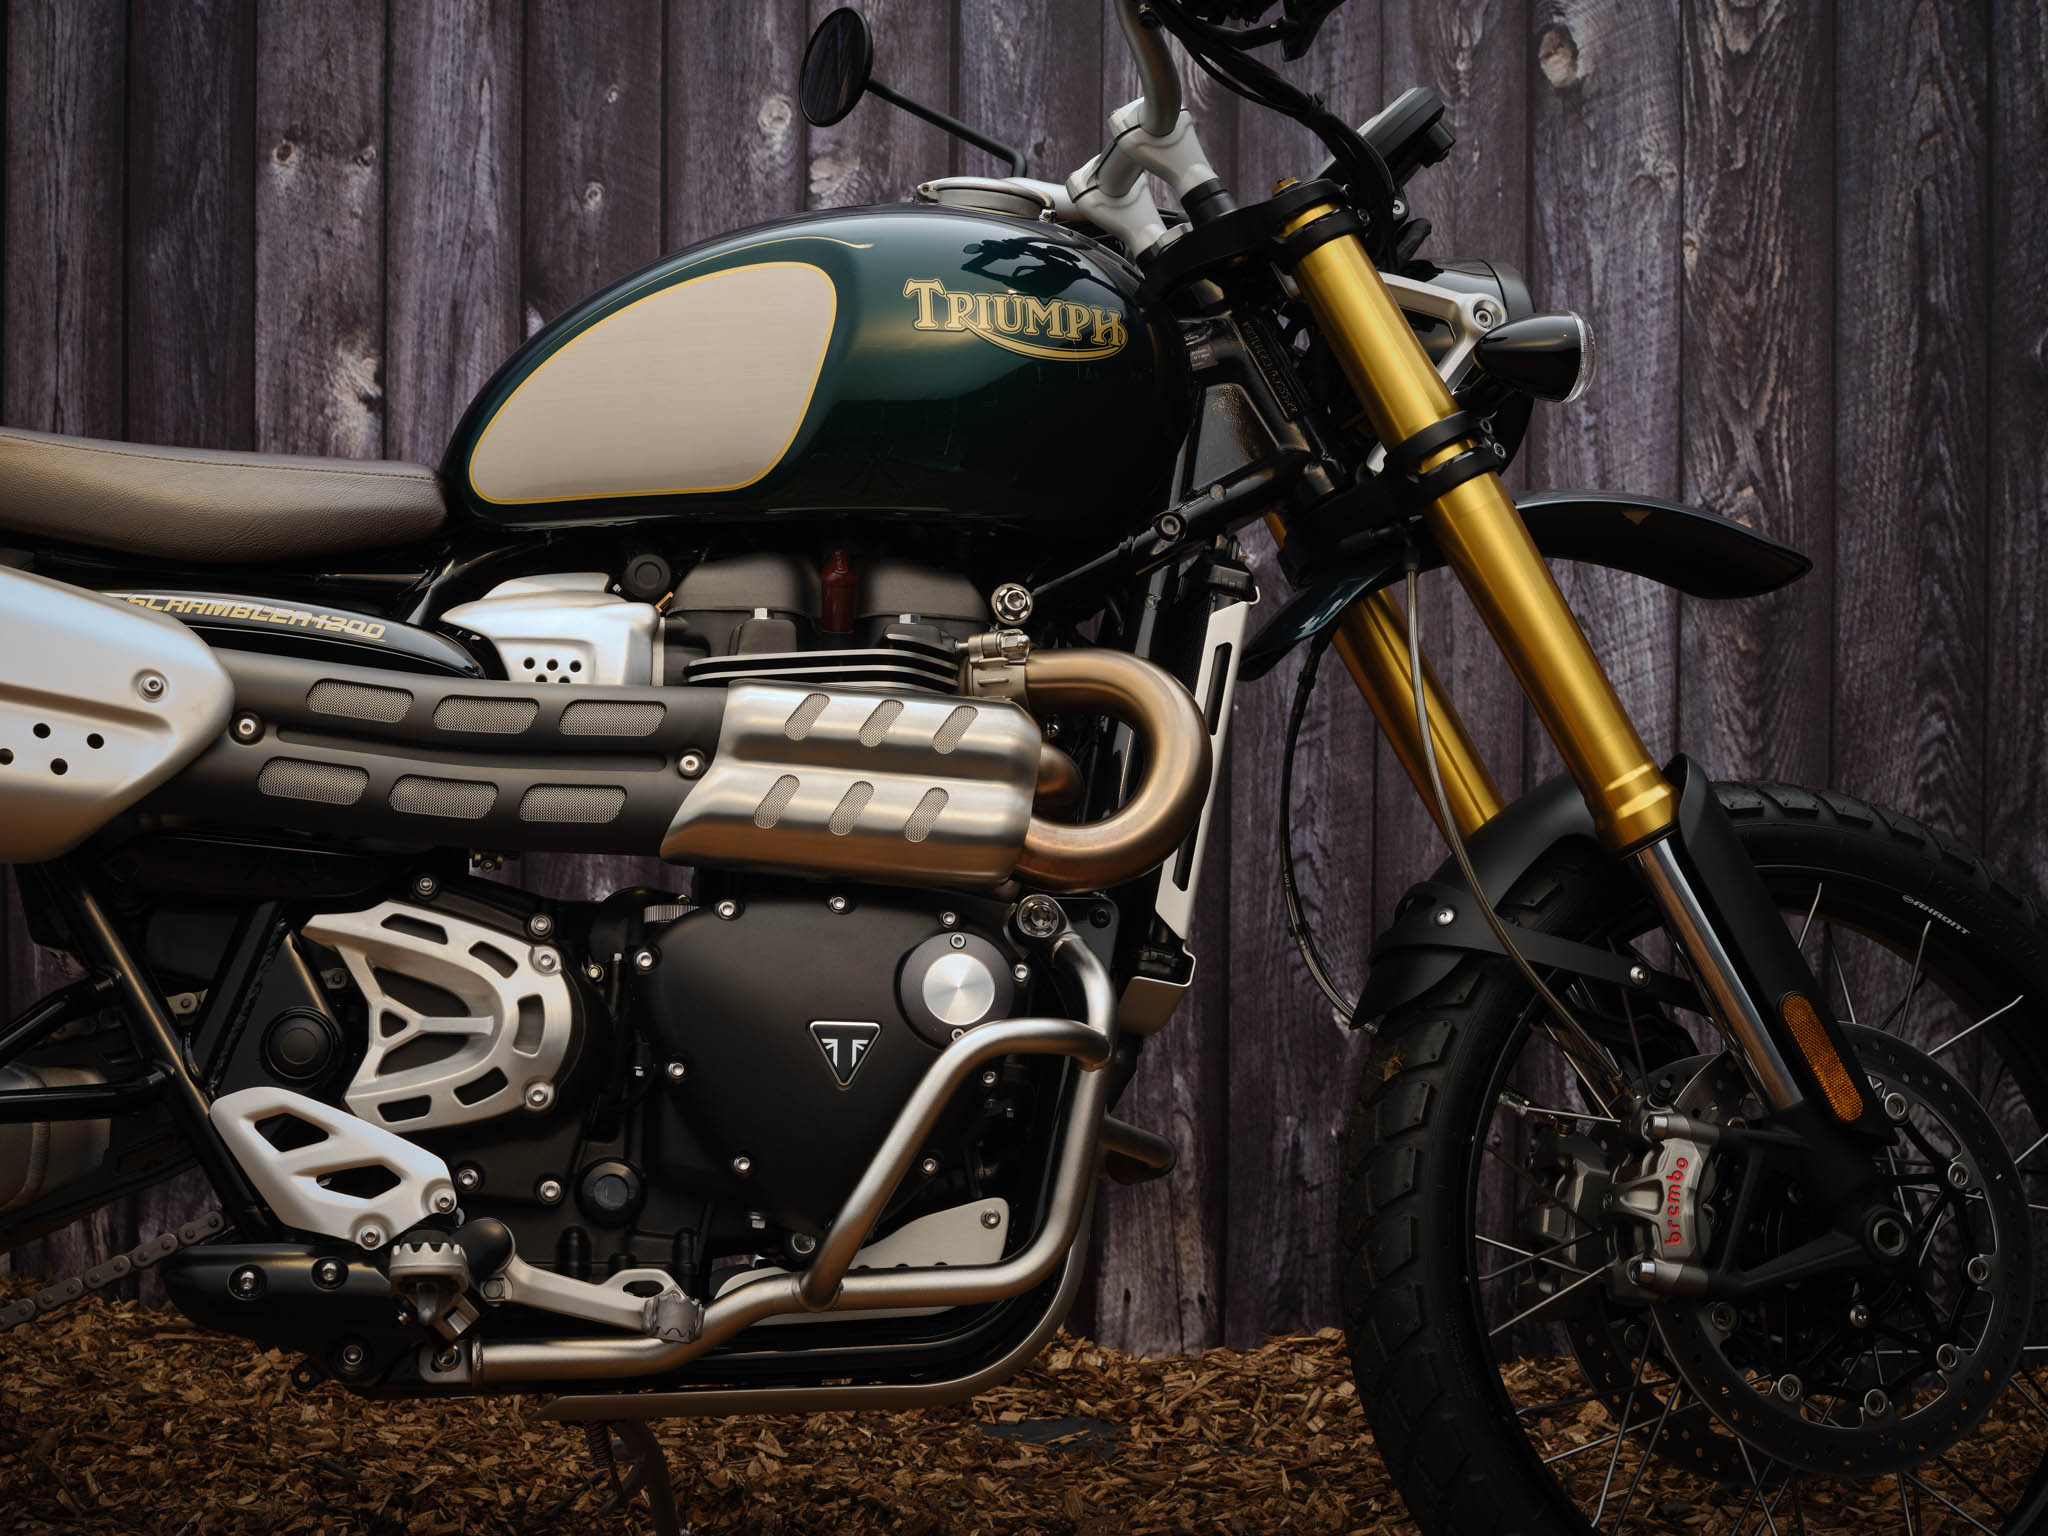 Triumph_Scrambler_1200_Steve_McQueen_Details_2021-5